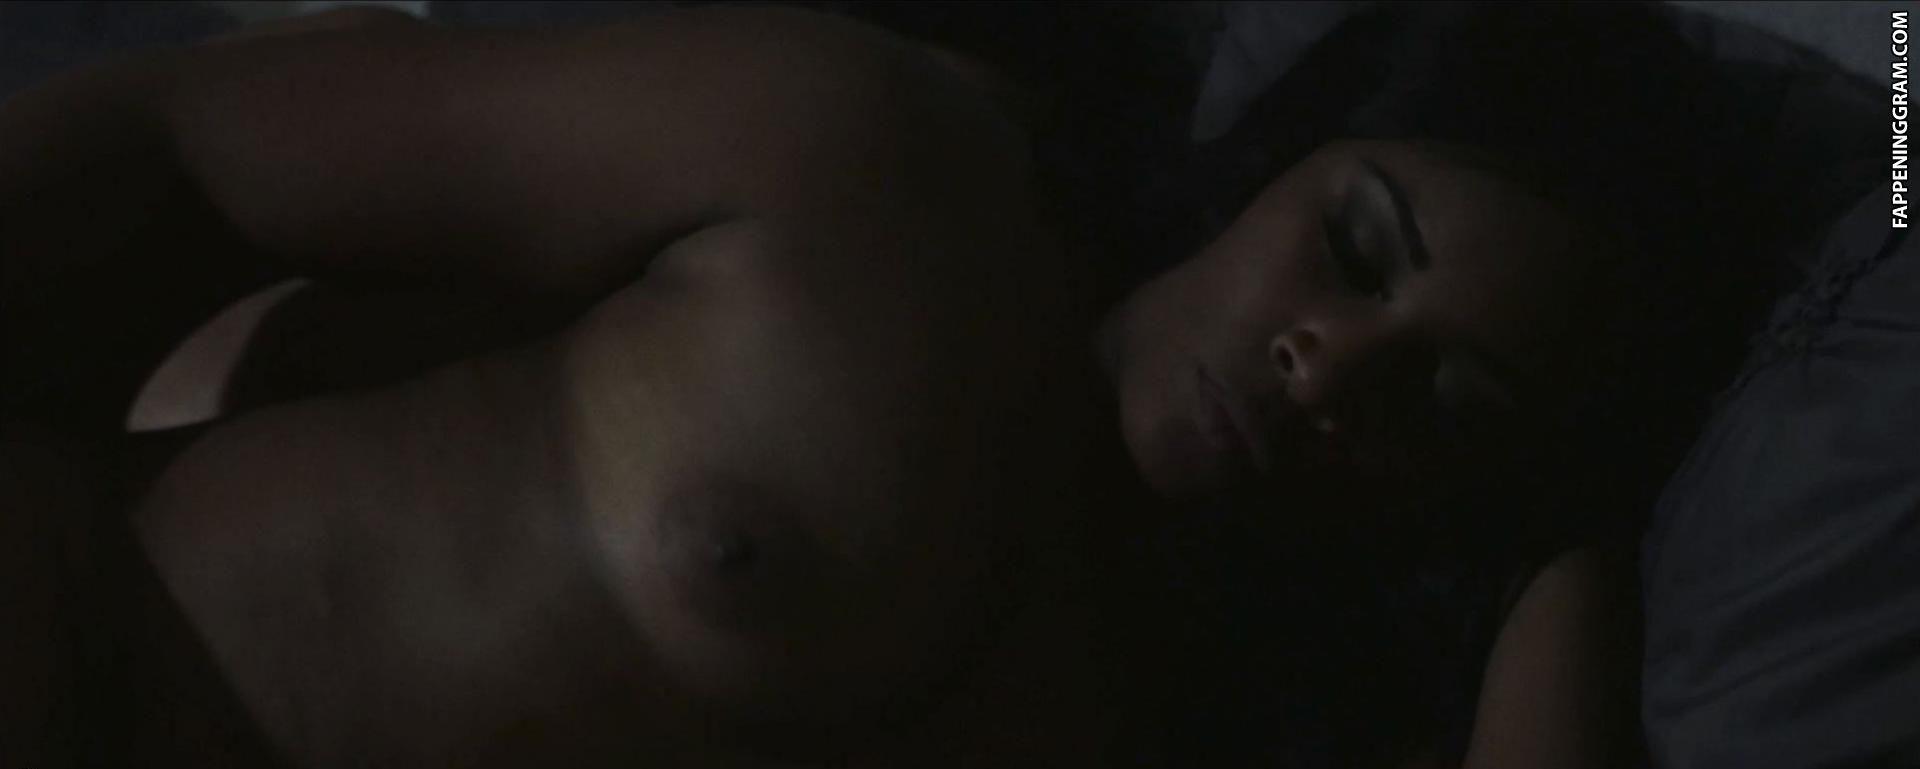 Jennifer lopez poses head to toe naked on new album cover